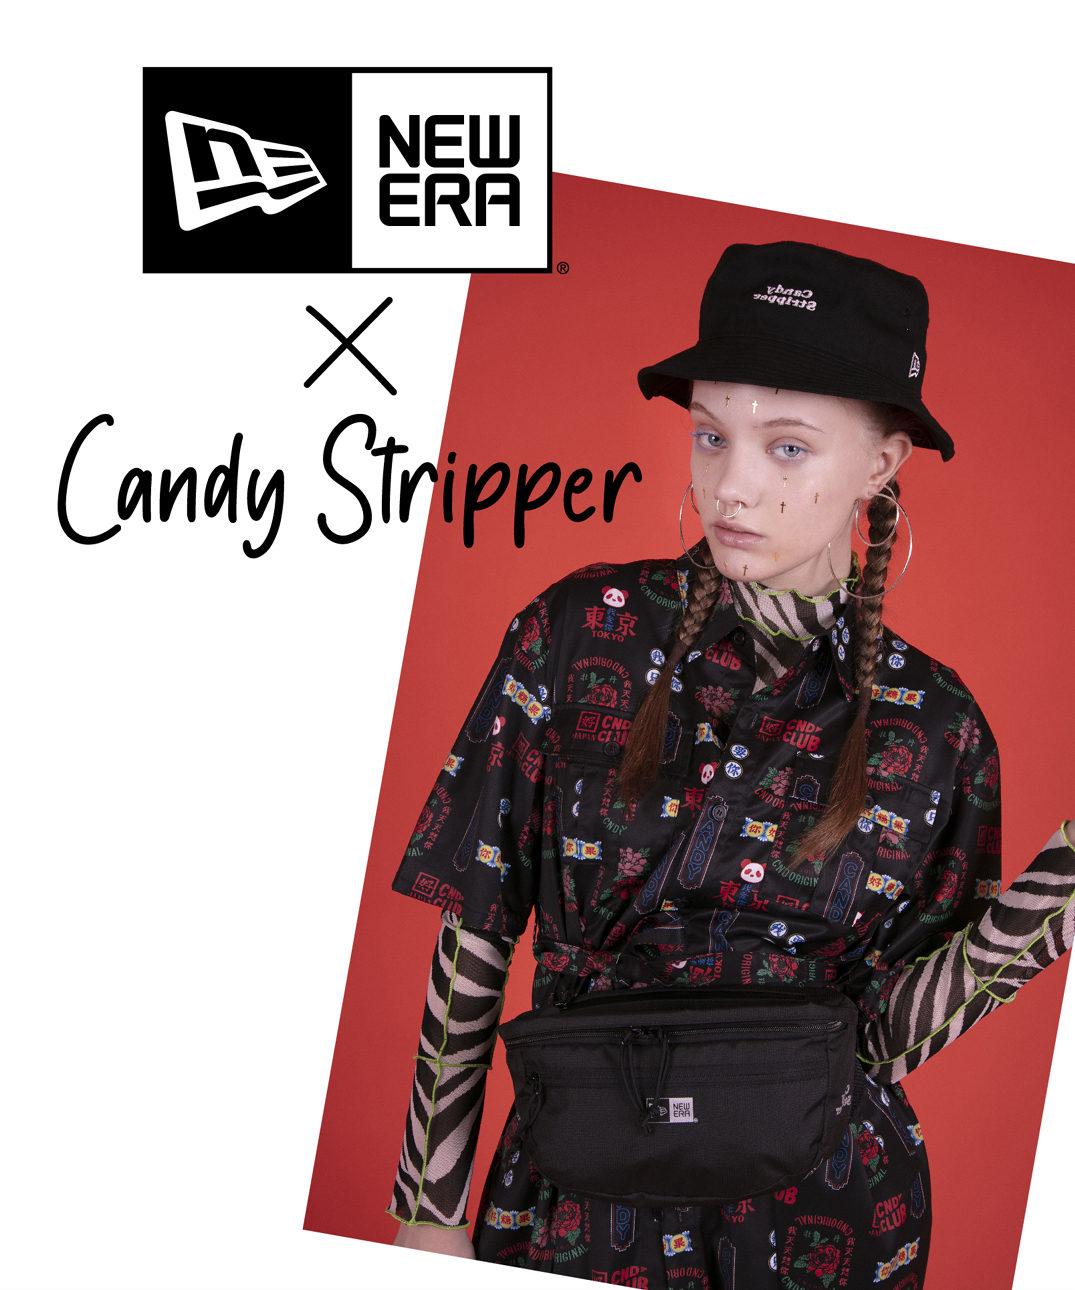 Candy Stripper(キャンディストリッパー )のショップニュース「【NEW ERA®×Candy Stripper】コラボアイテムをCHECK!」